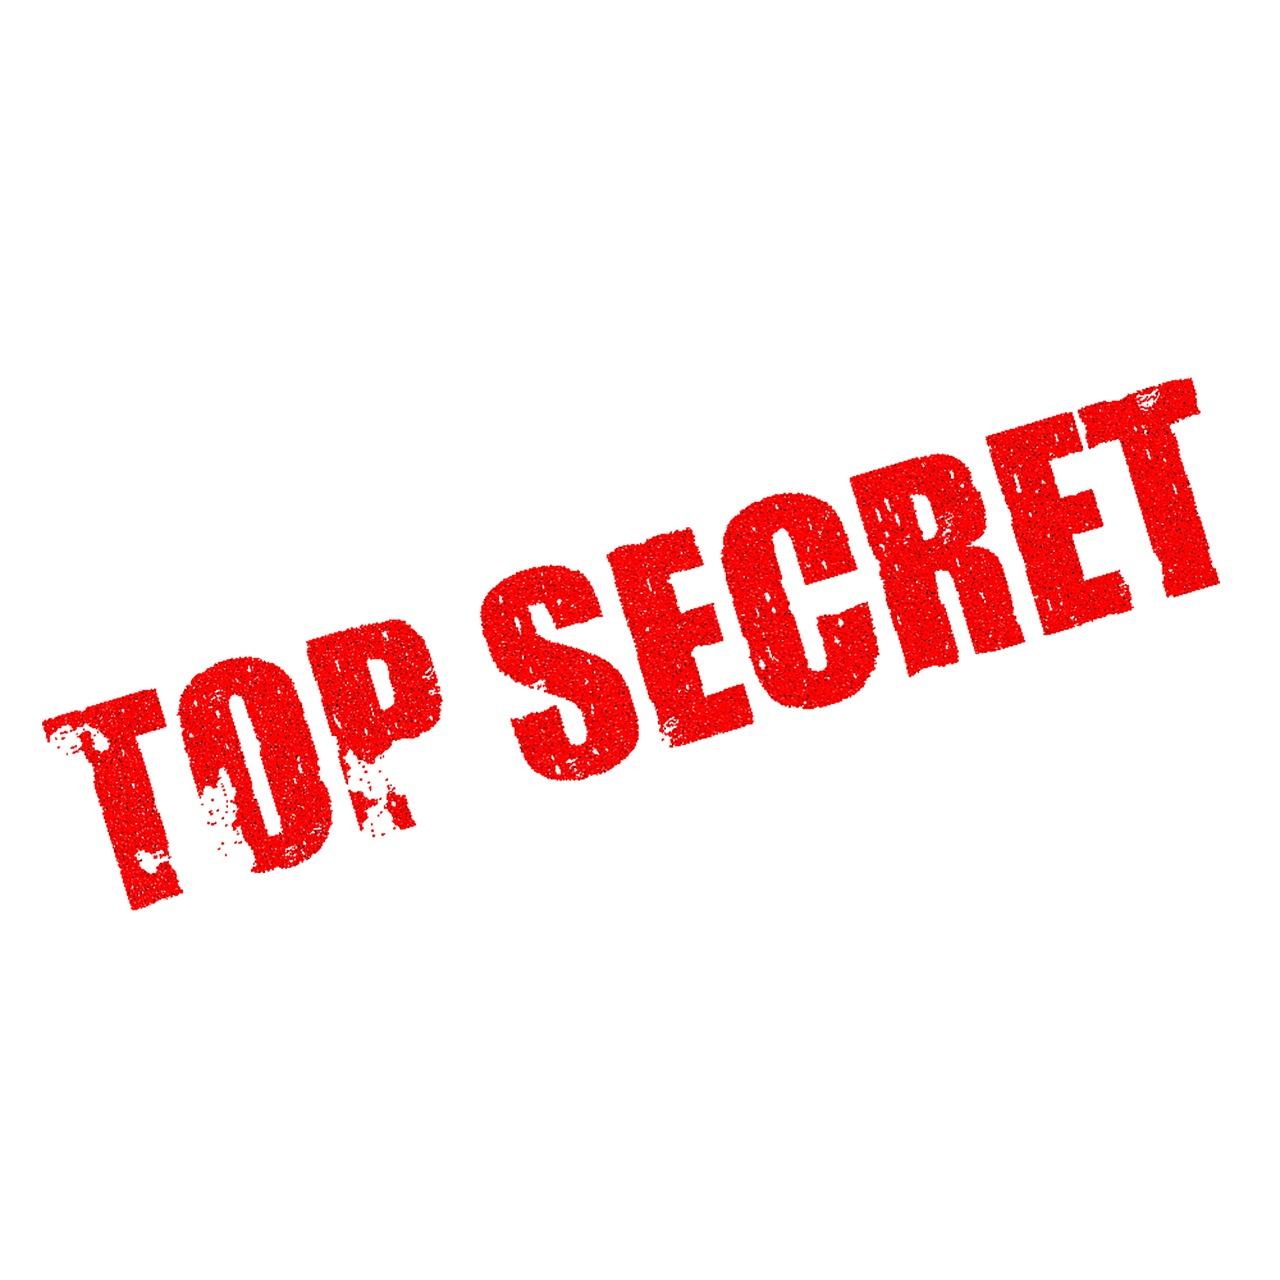 maxpixel_freegreatpicture_com-secrecy-top-secret-confidential-private-classified-1726358.jpg